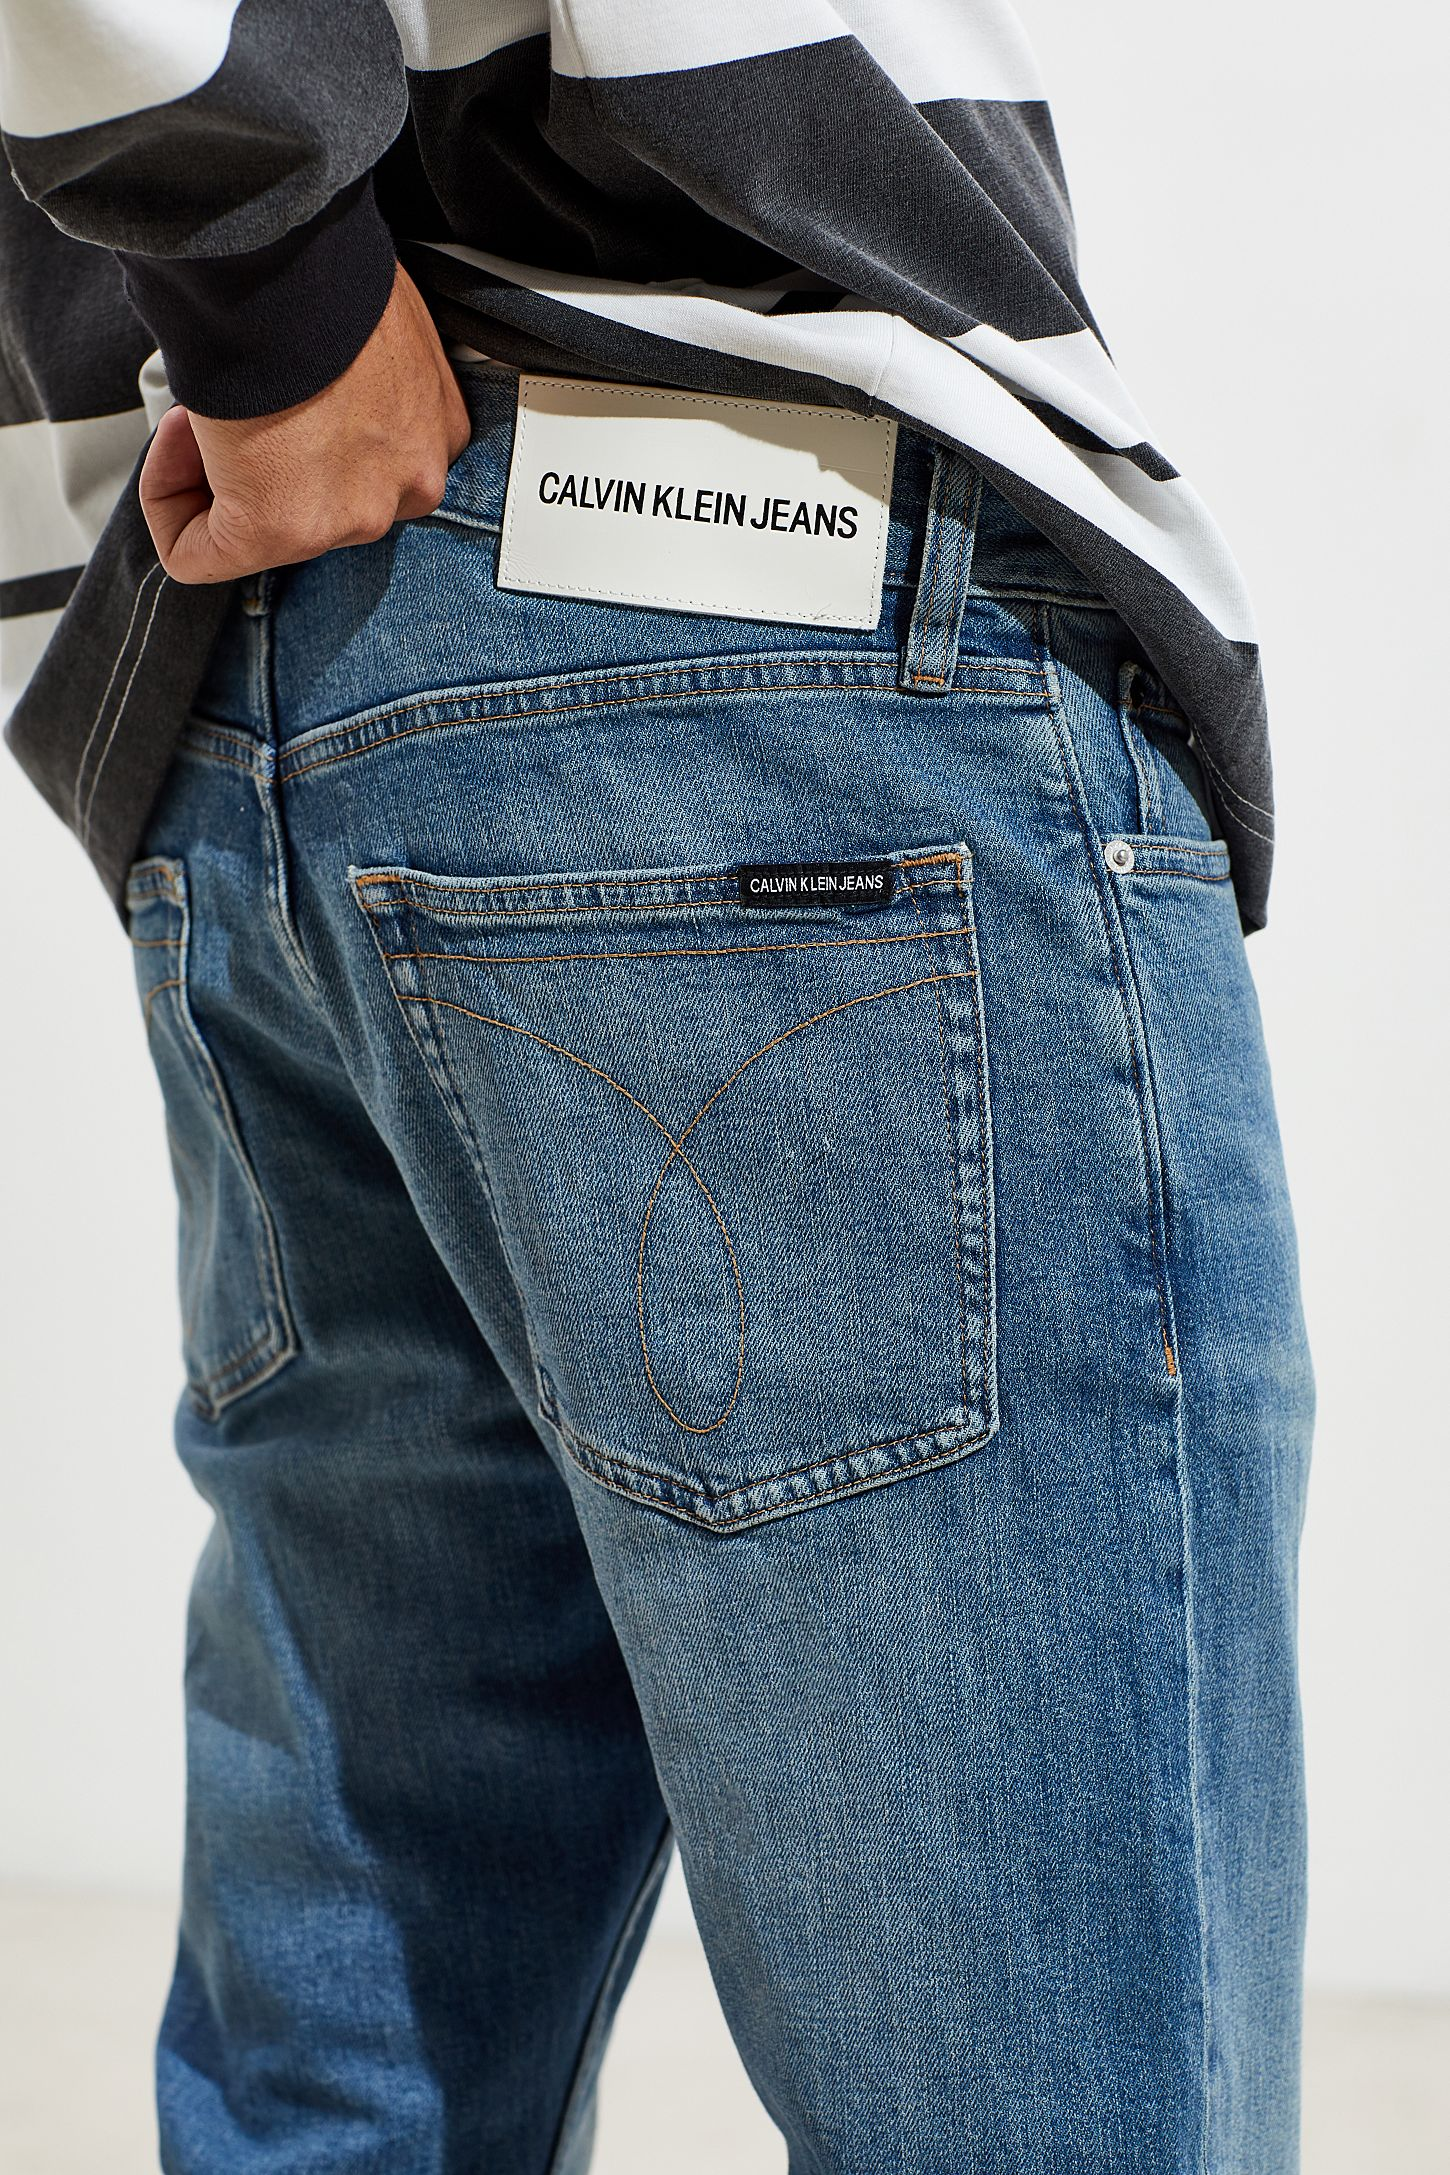 informazioni per 0b301 ade58 Calvin Klein Ruby Blue Slim Jean